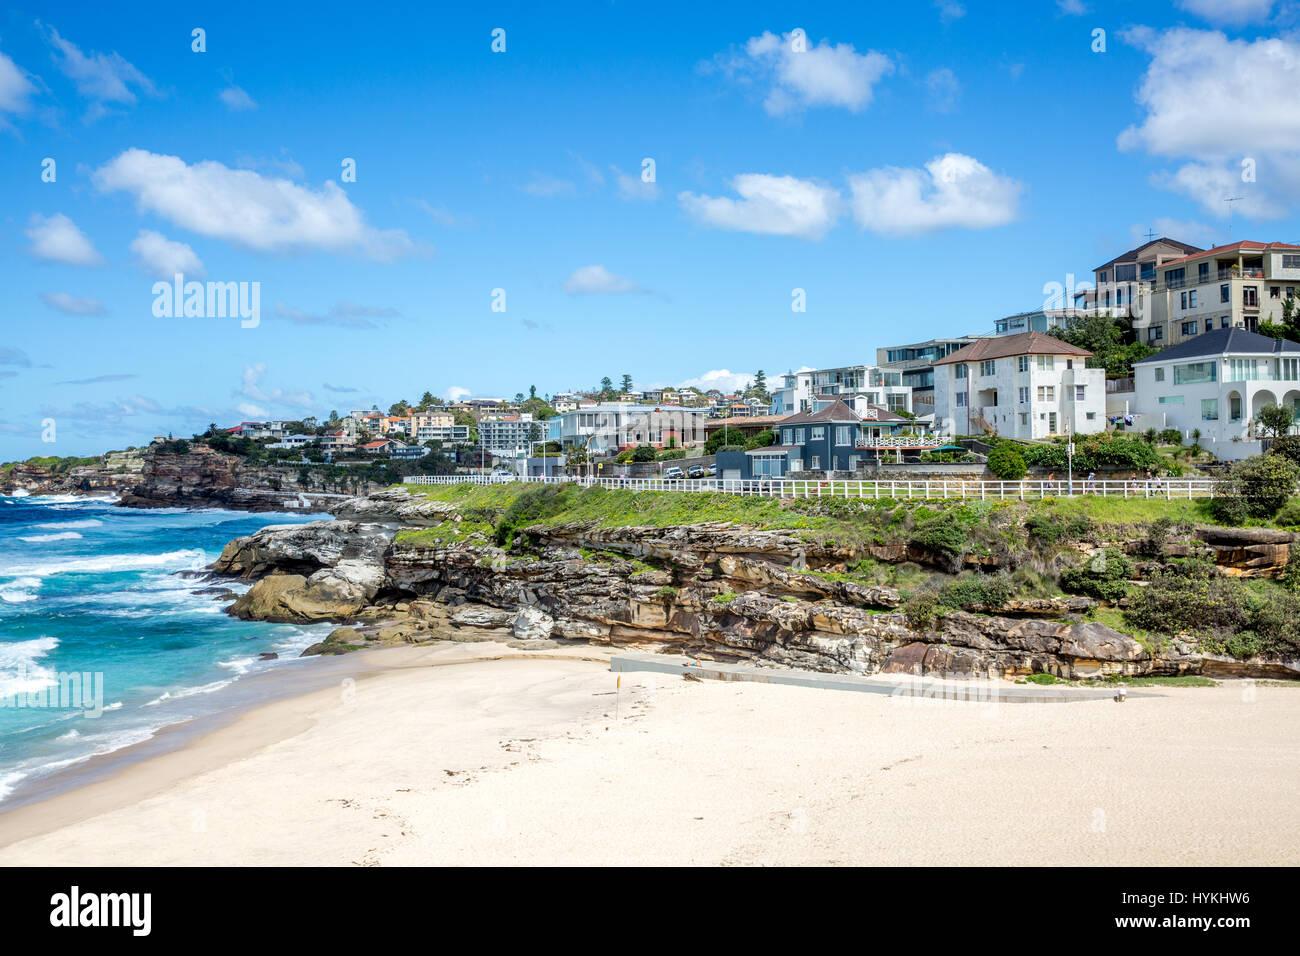 Tamarama beach in Sydney eastern suburbs with the Bondi to Bronte coastal walk path , Sydney, Australia Stock Photo